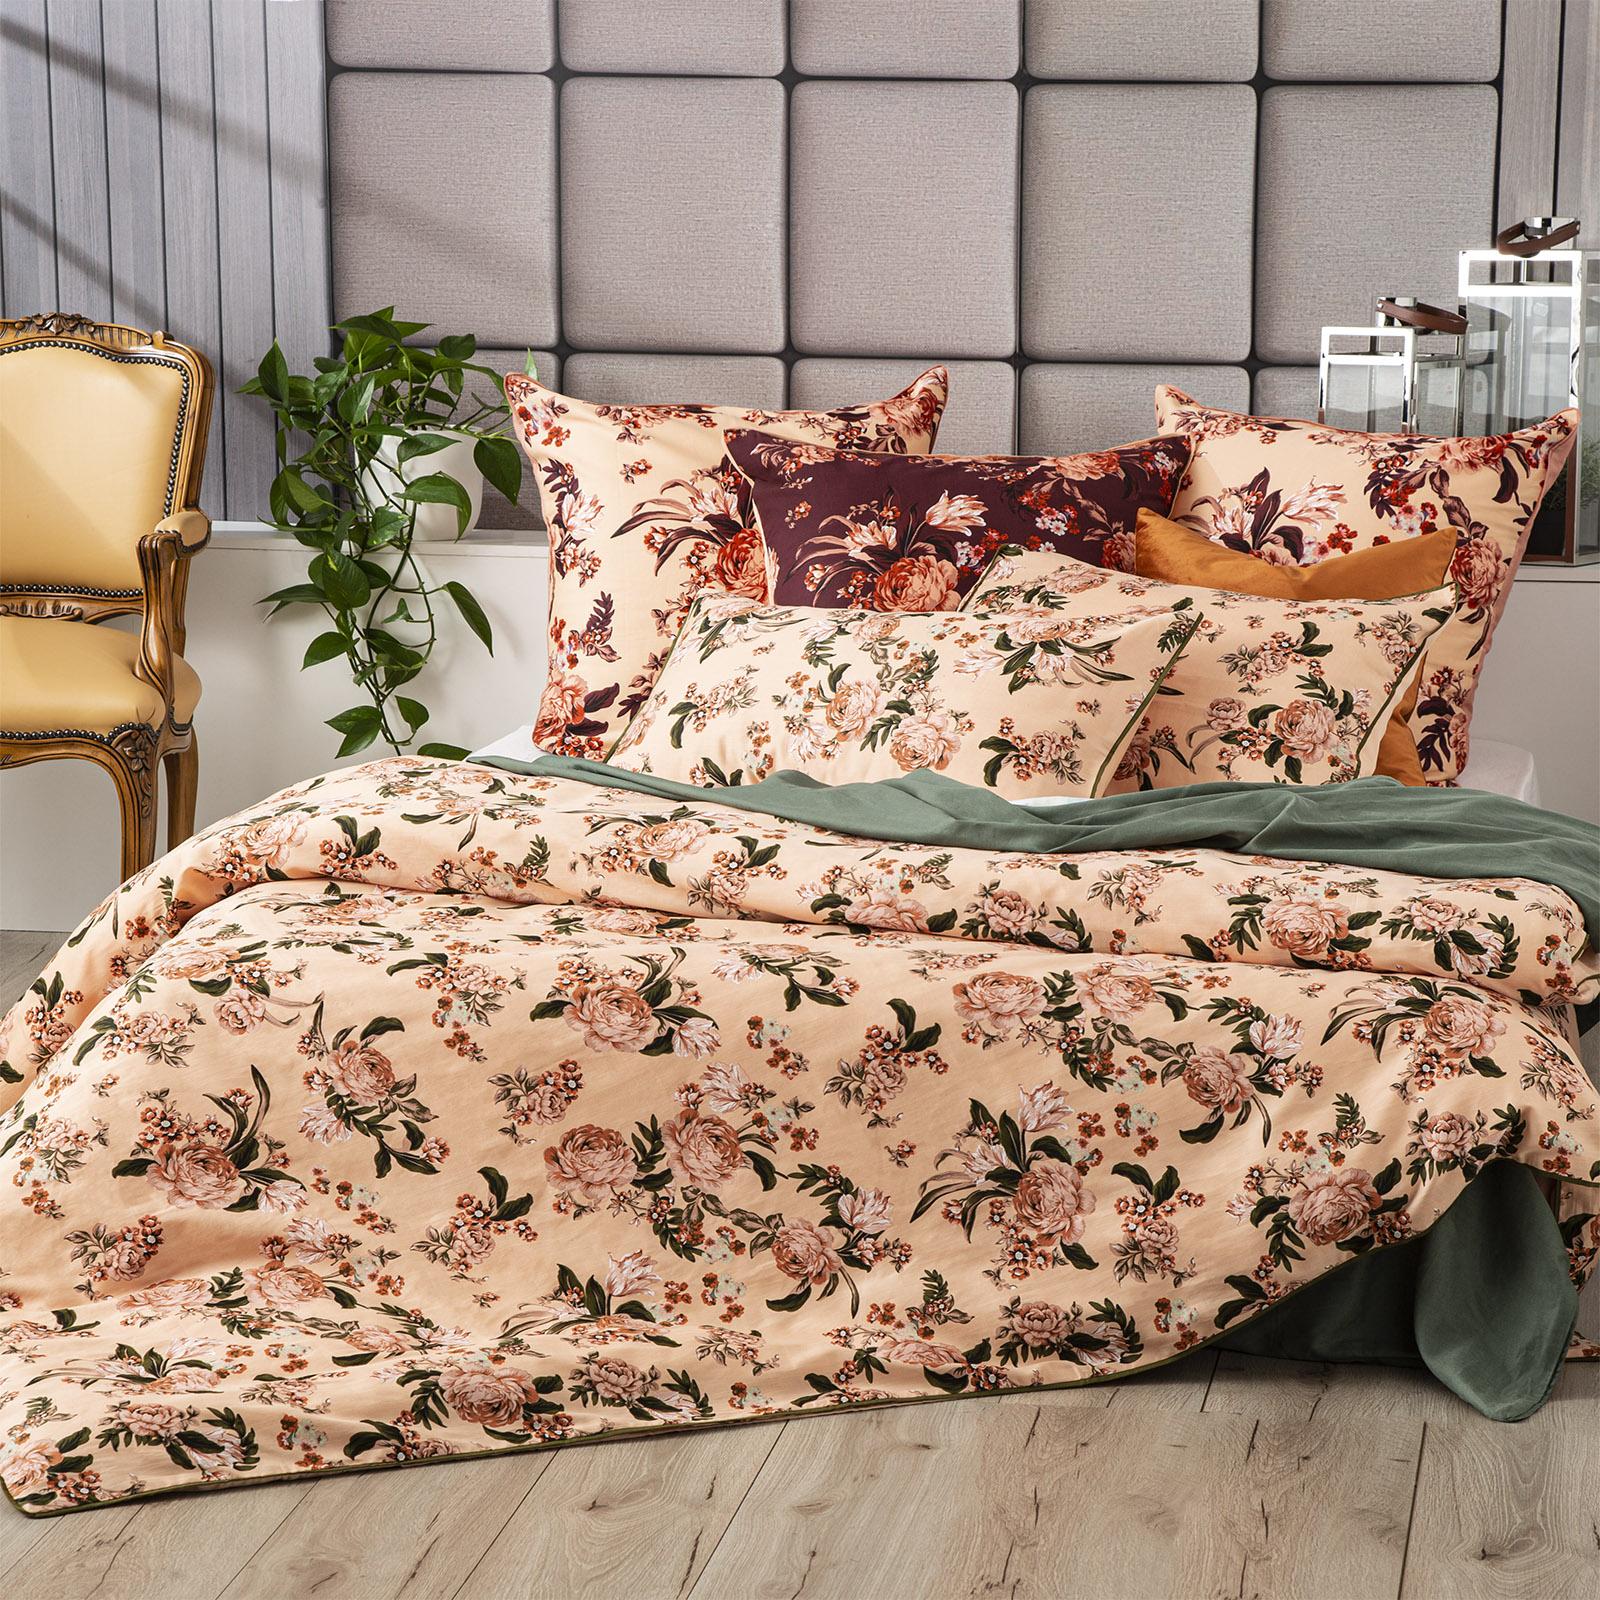 Renee Taylor Secret Garden Quilt cover Set 300 Thread Count 100% Cotton